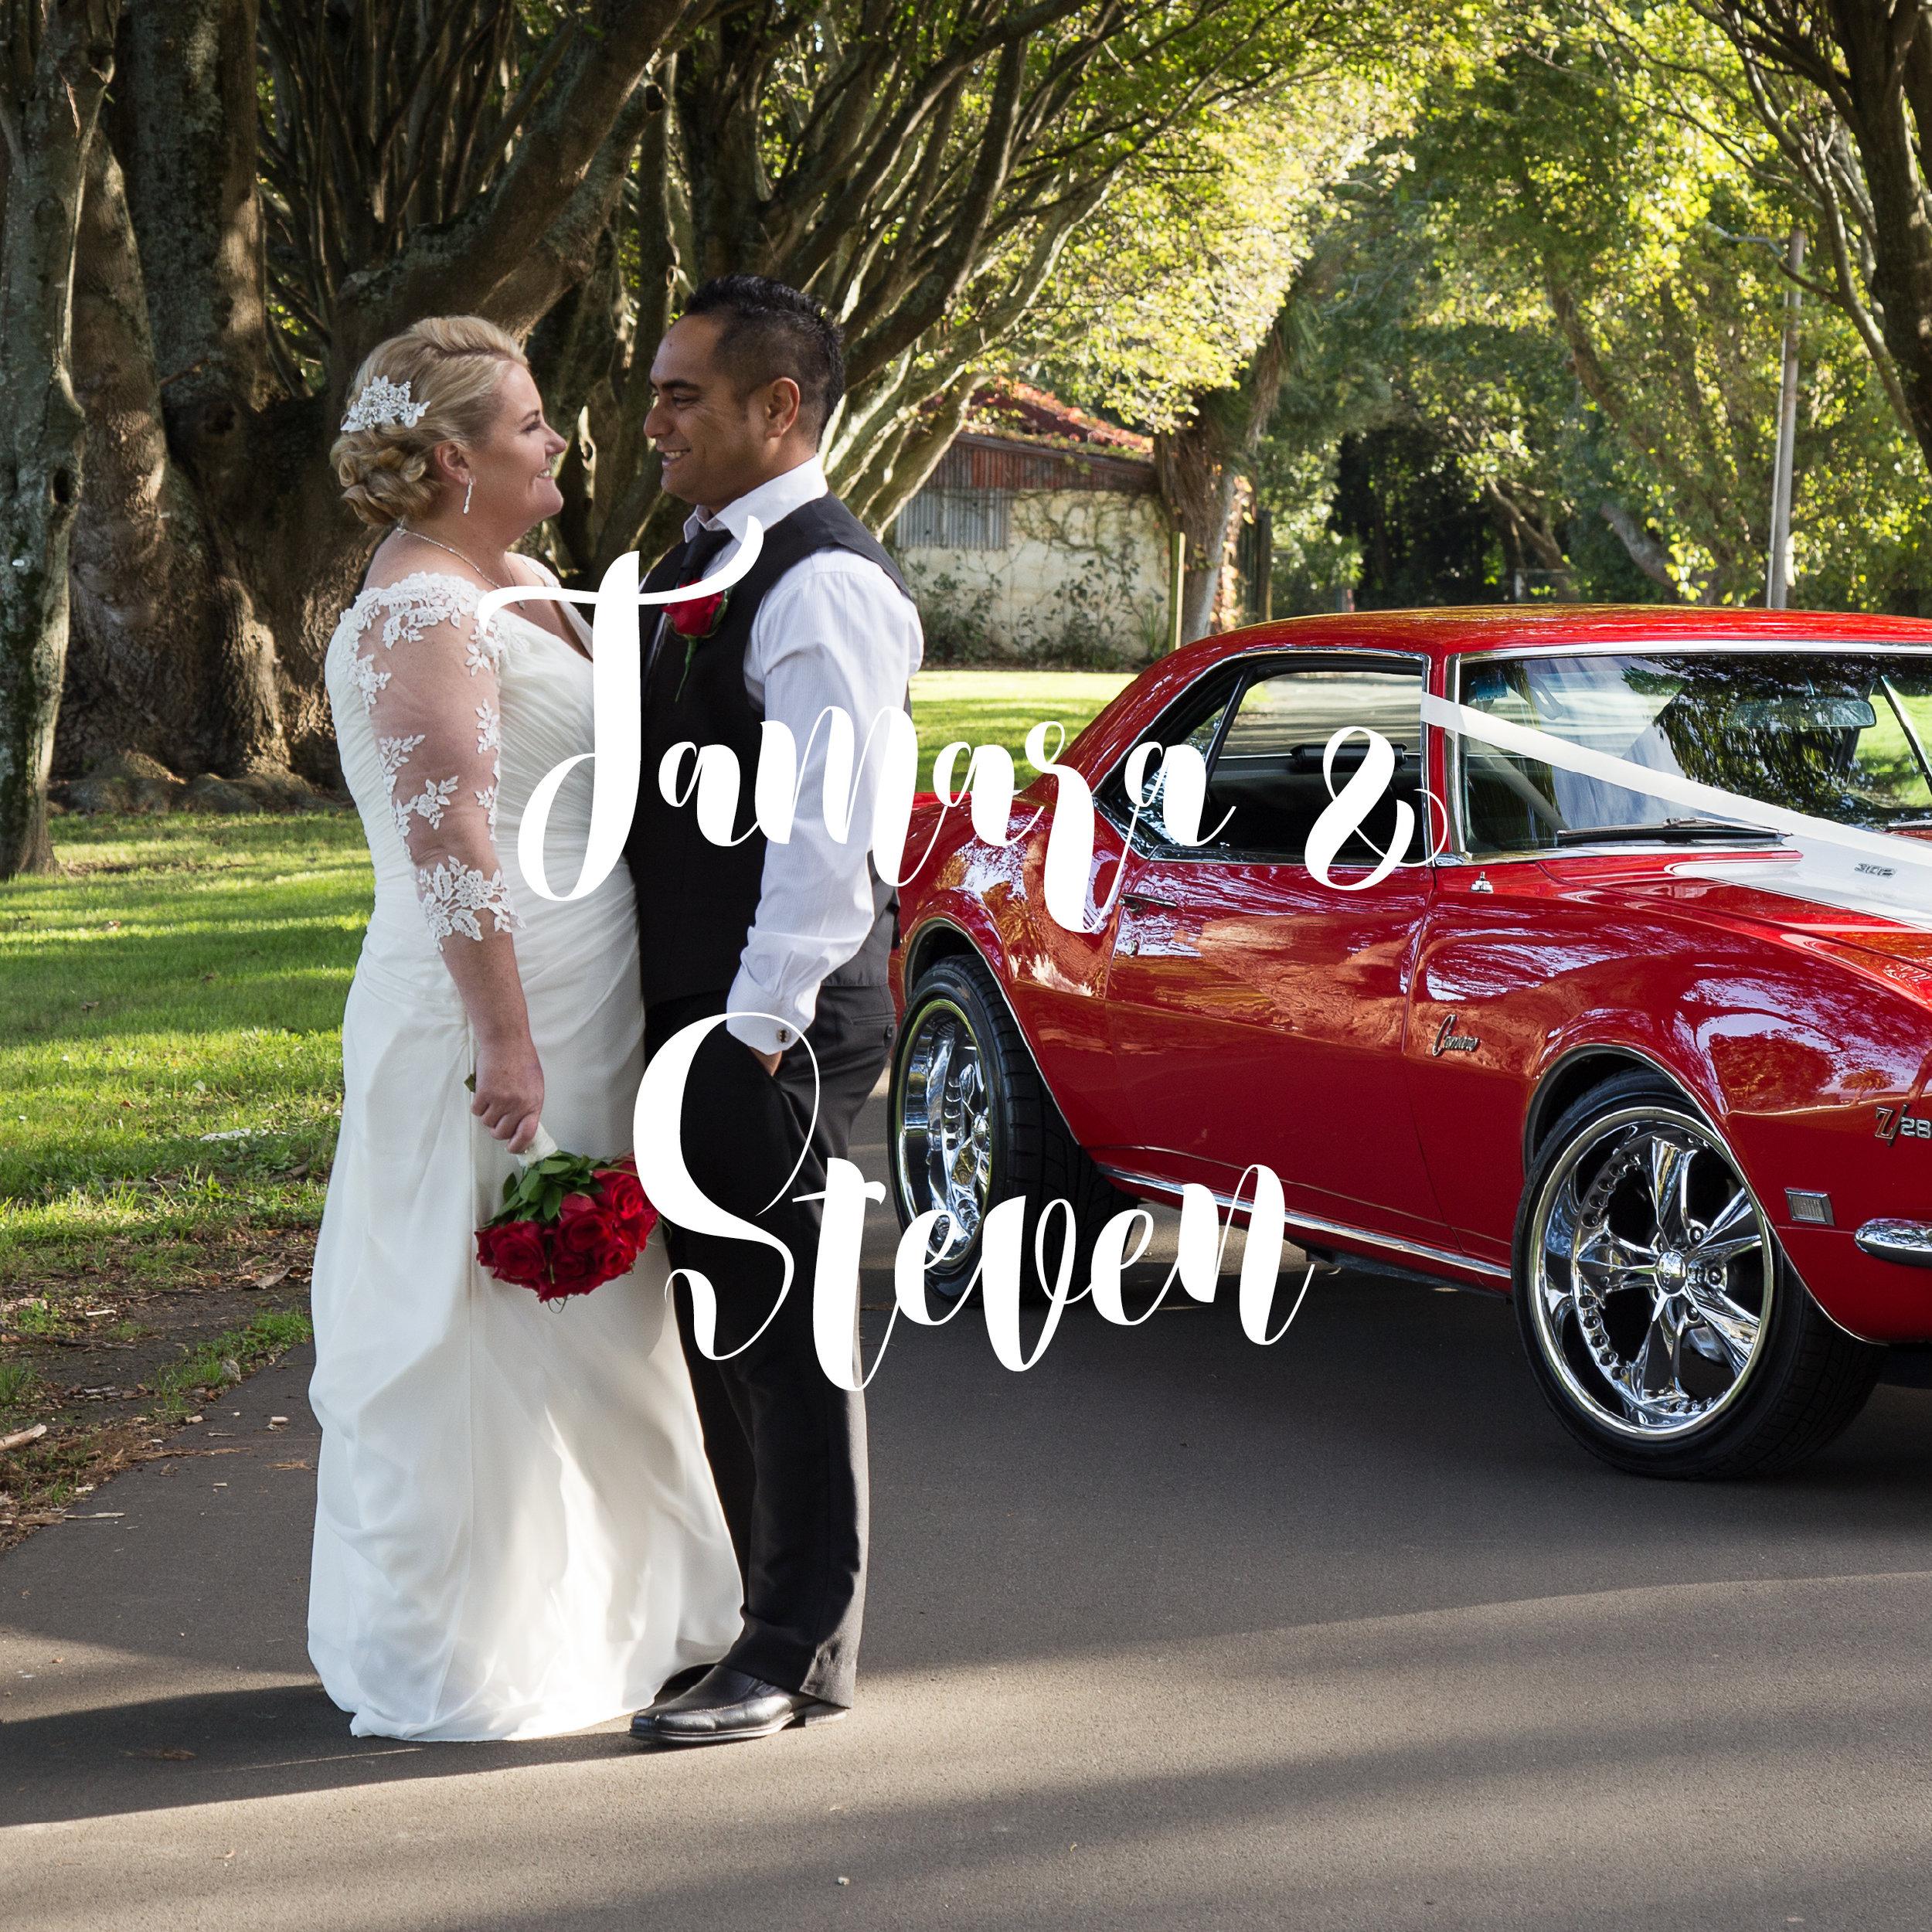 highlight-wedding-photography-palmerston-north-awapuni-racecourse